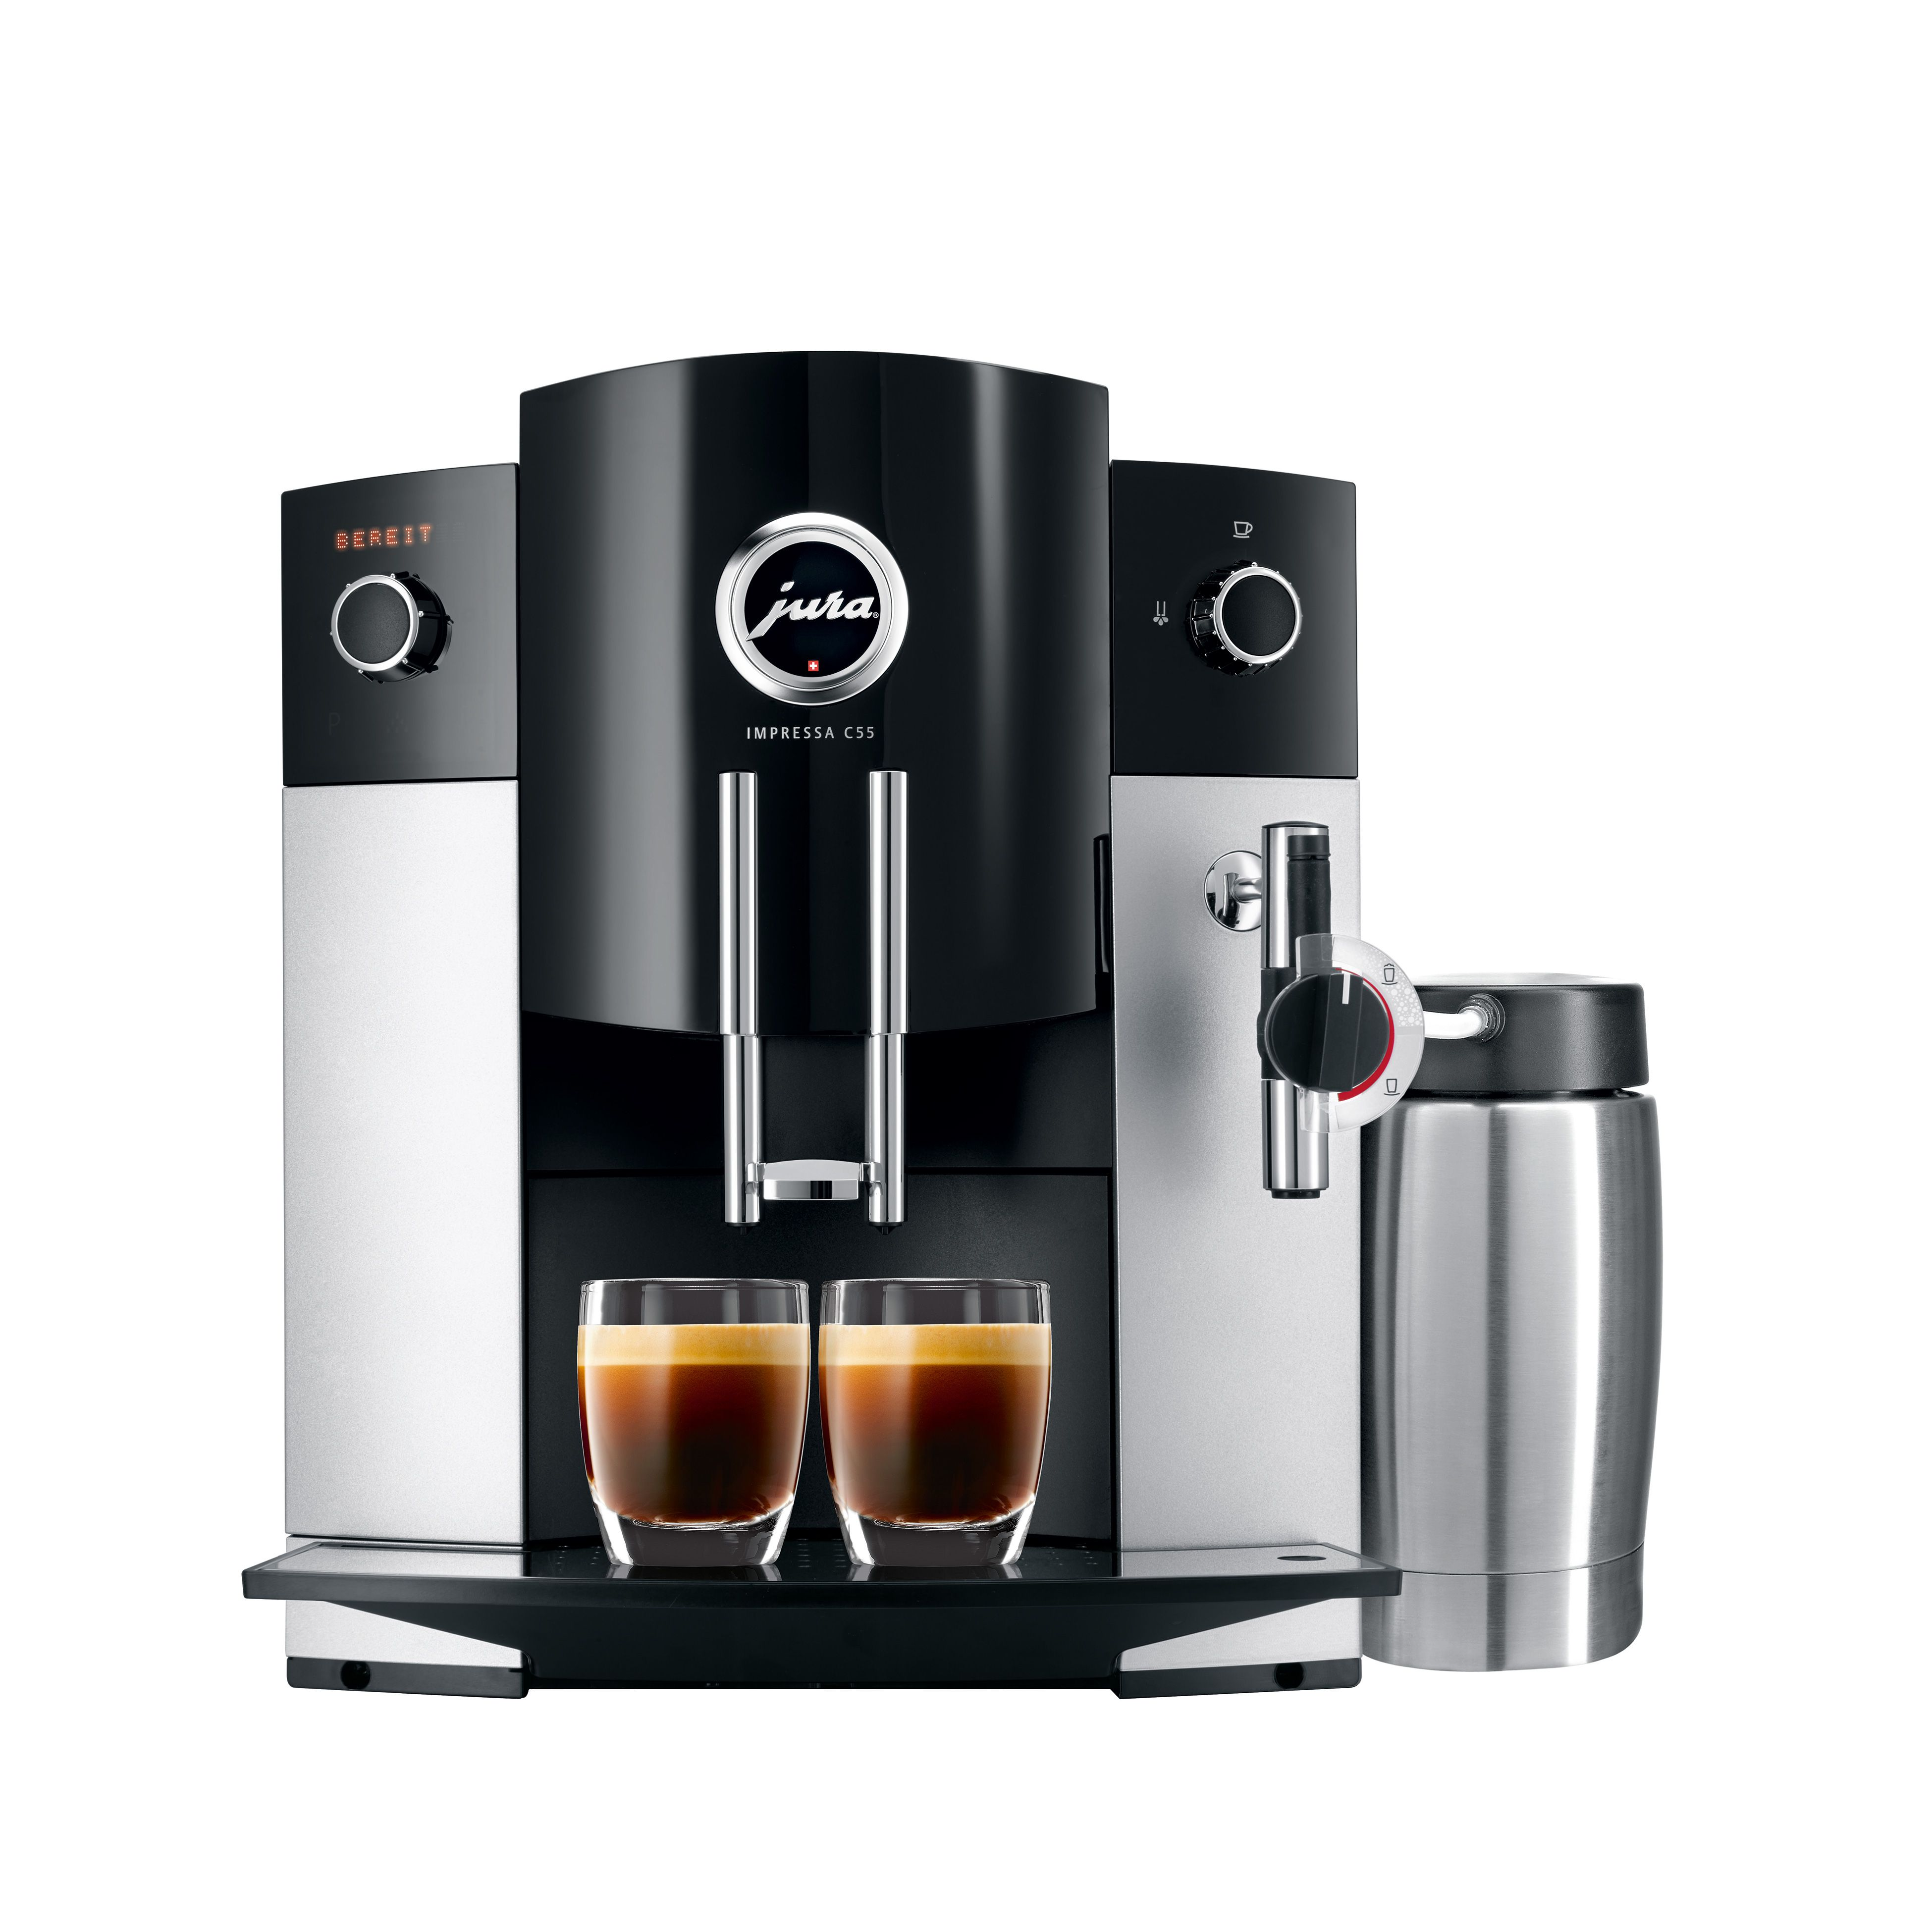 Impressa C65 | Automatic coffee machine, Coffee machine ...